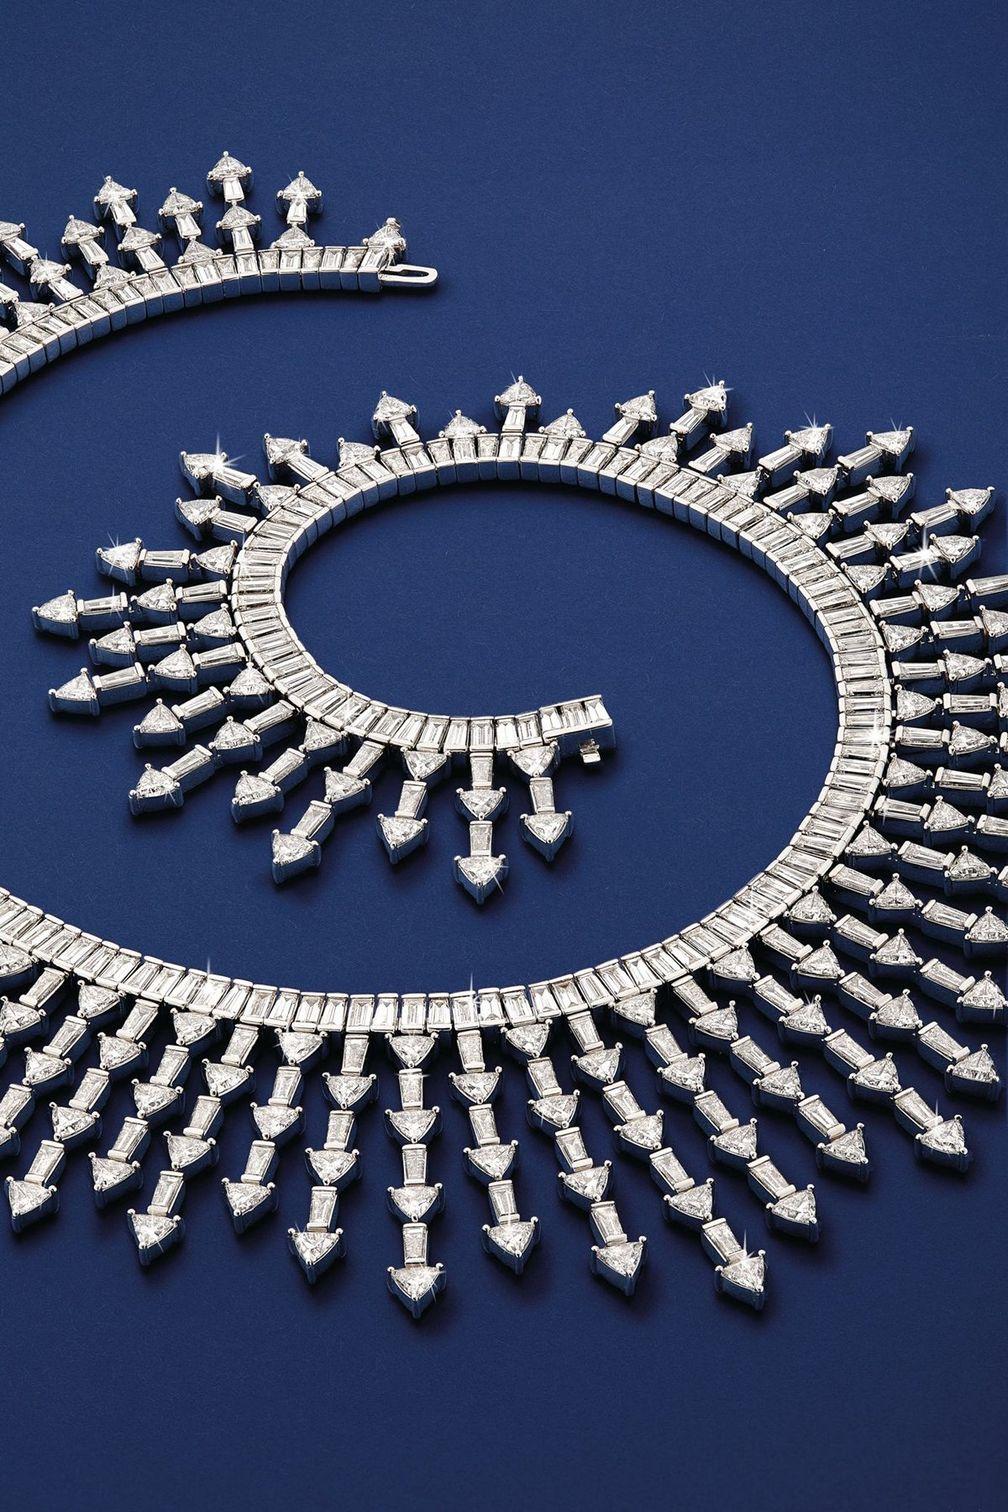 Колье Supernova от Lark & Berry x Diamond Foundry из белого золота с бриллиантами